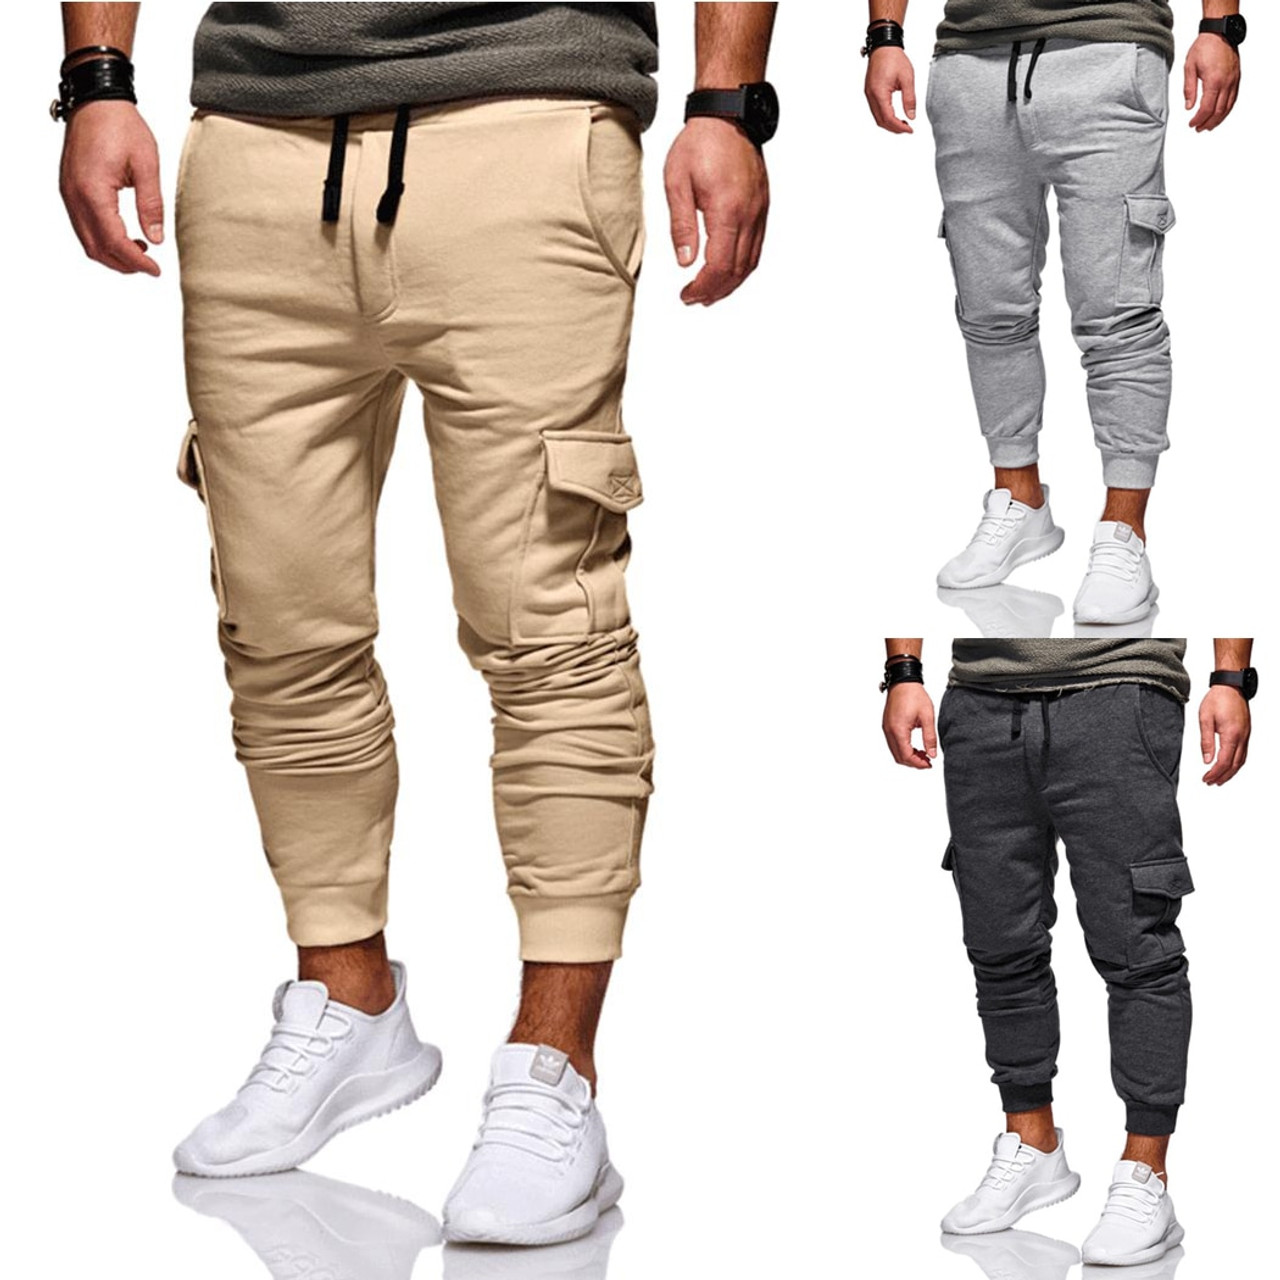 479ff85fdbb64d ... New 2019 Men Cargo Pants Fashion Tactical Joggers Fitness Workout  Pockets Sweatpants Plus Size 4XL Casual ...